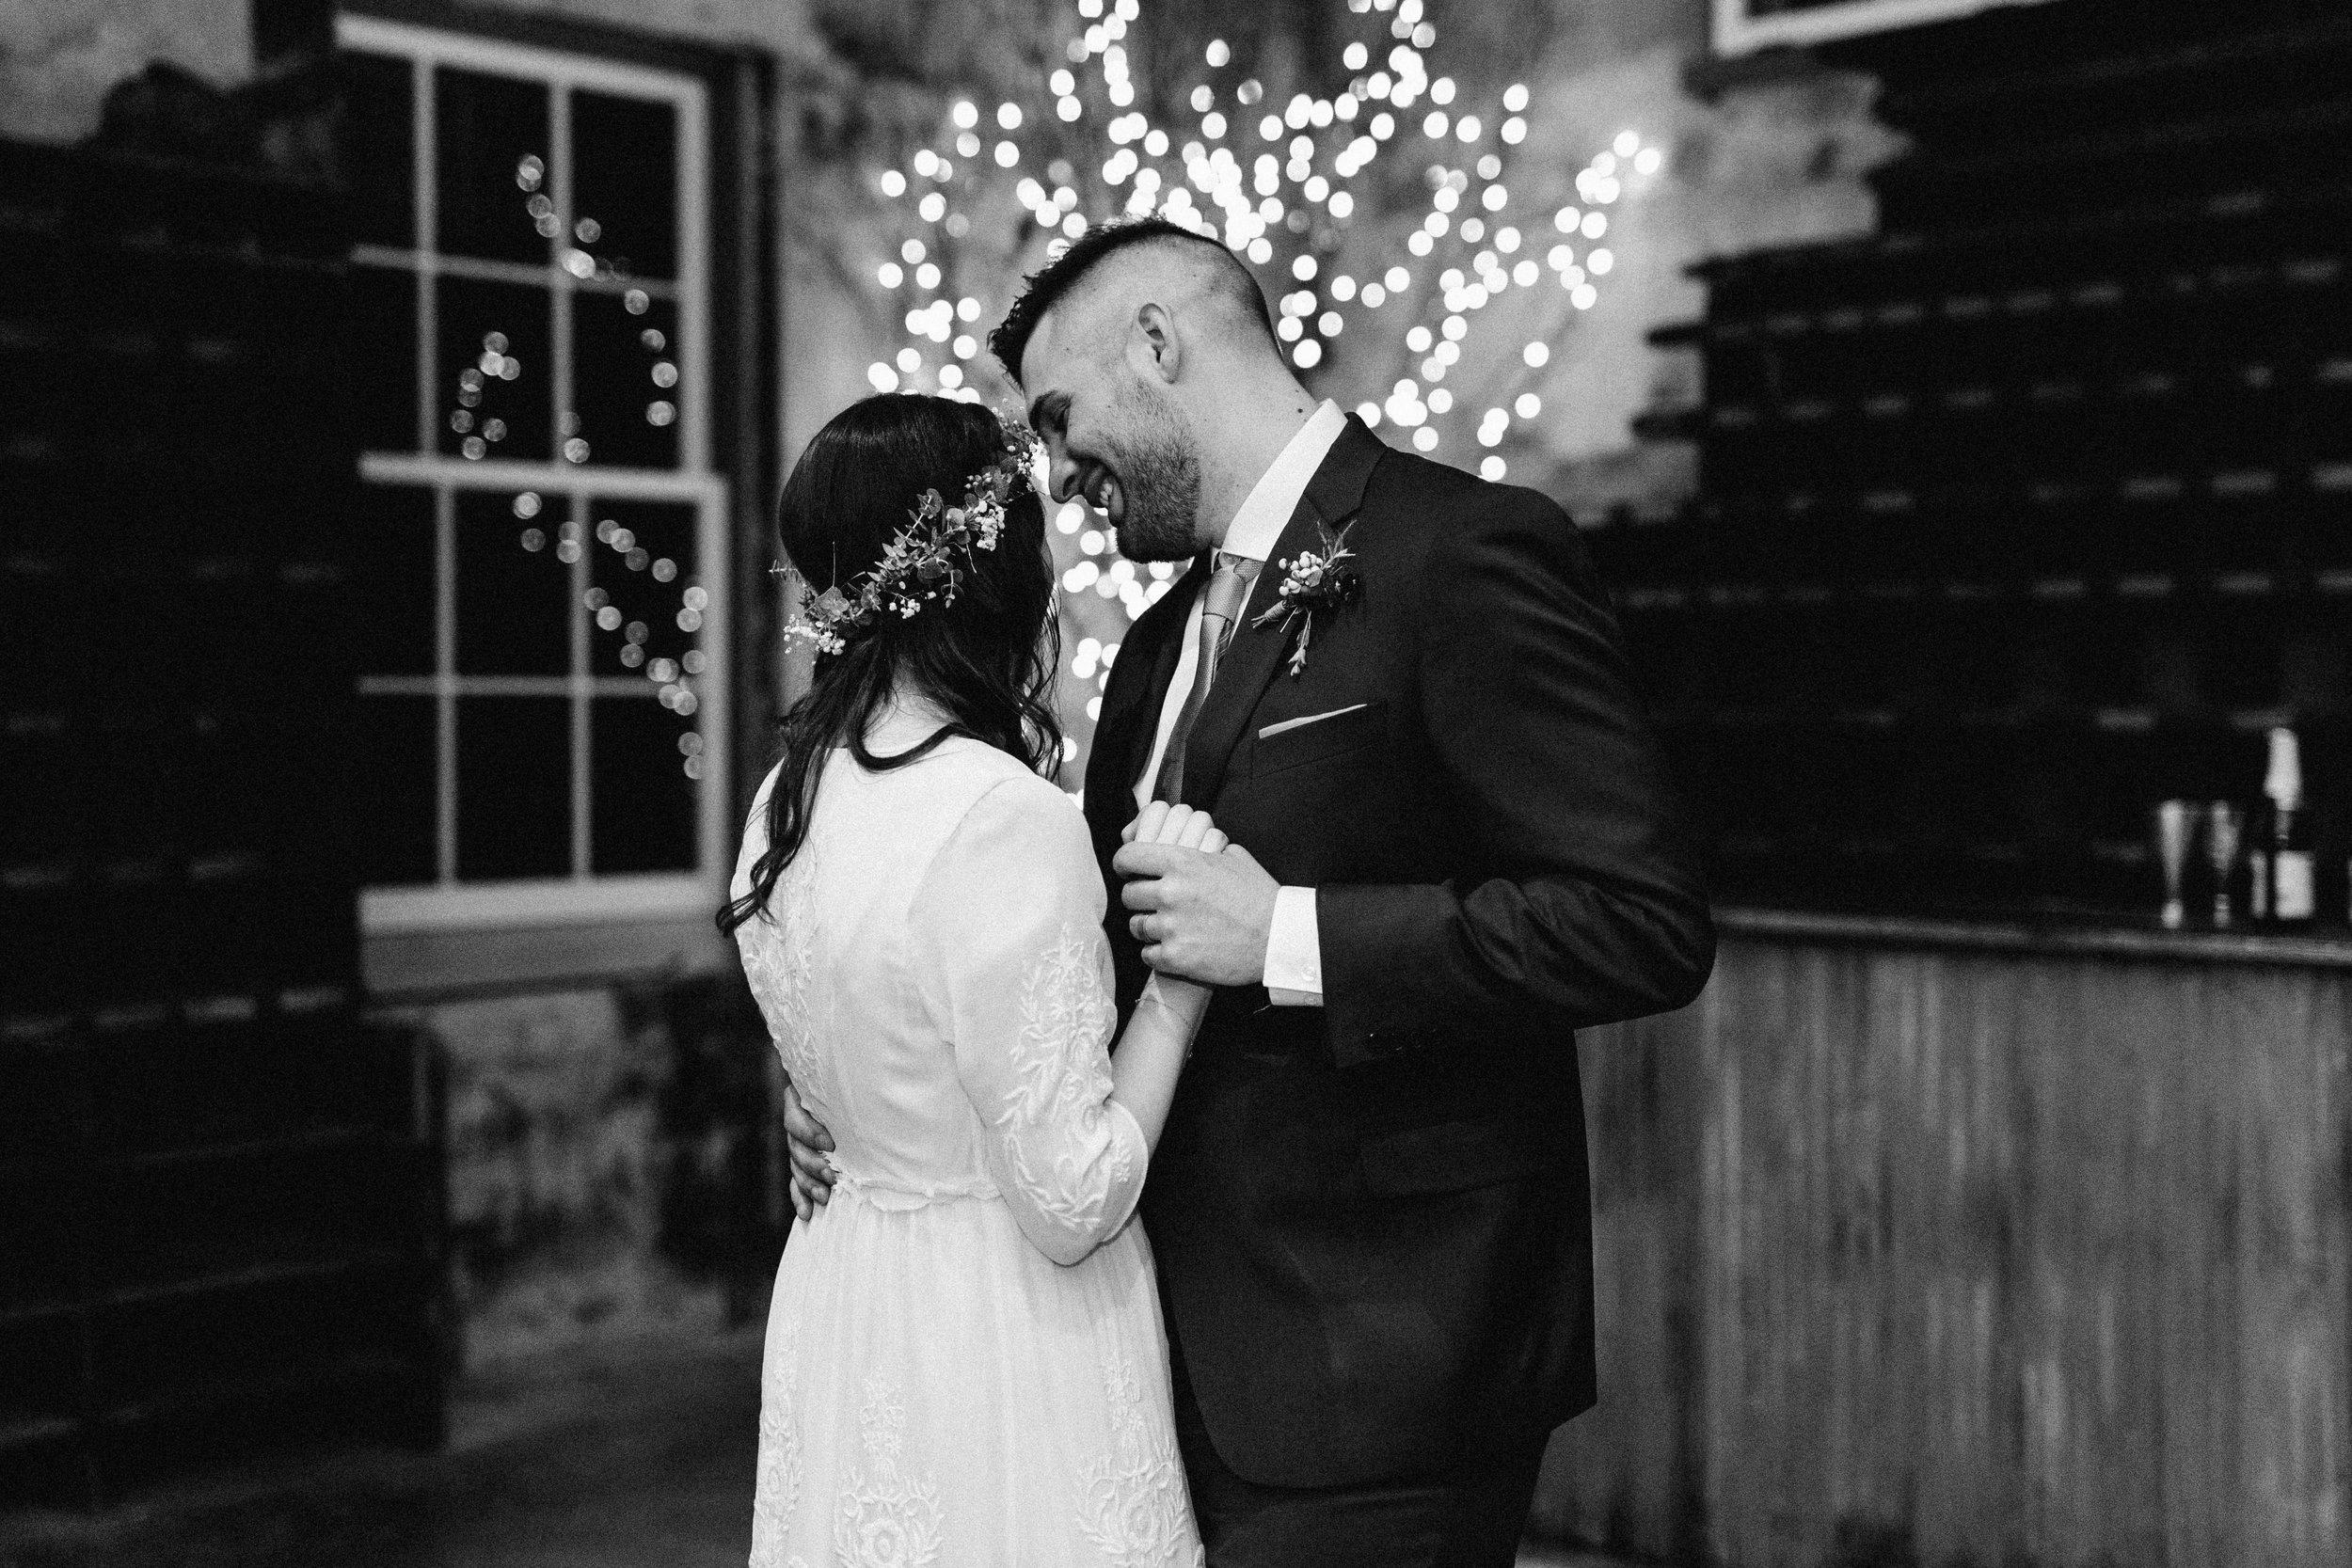 austin-wedding-photographer-64.jpg